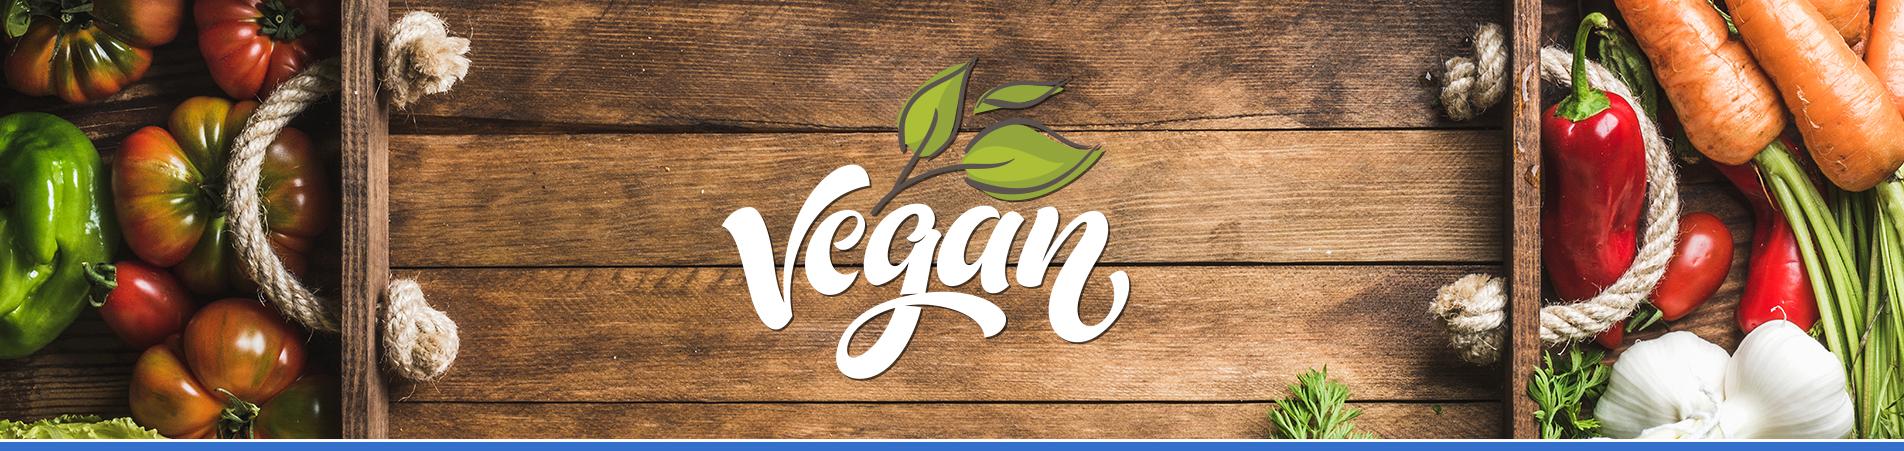 prodotti surgelati per vegan e vegani